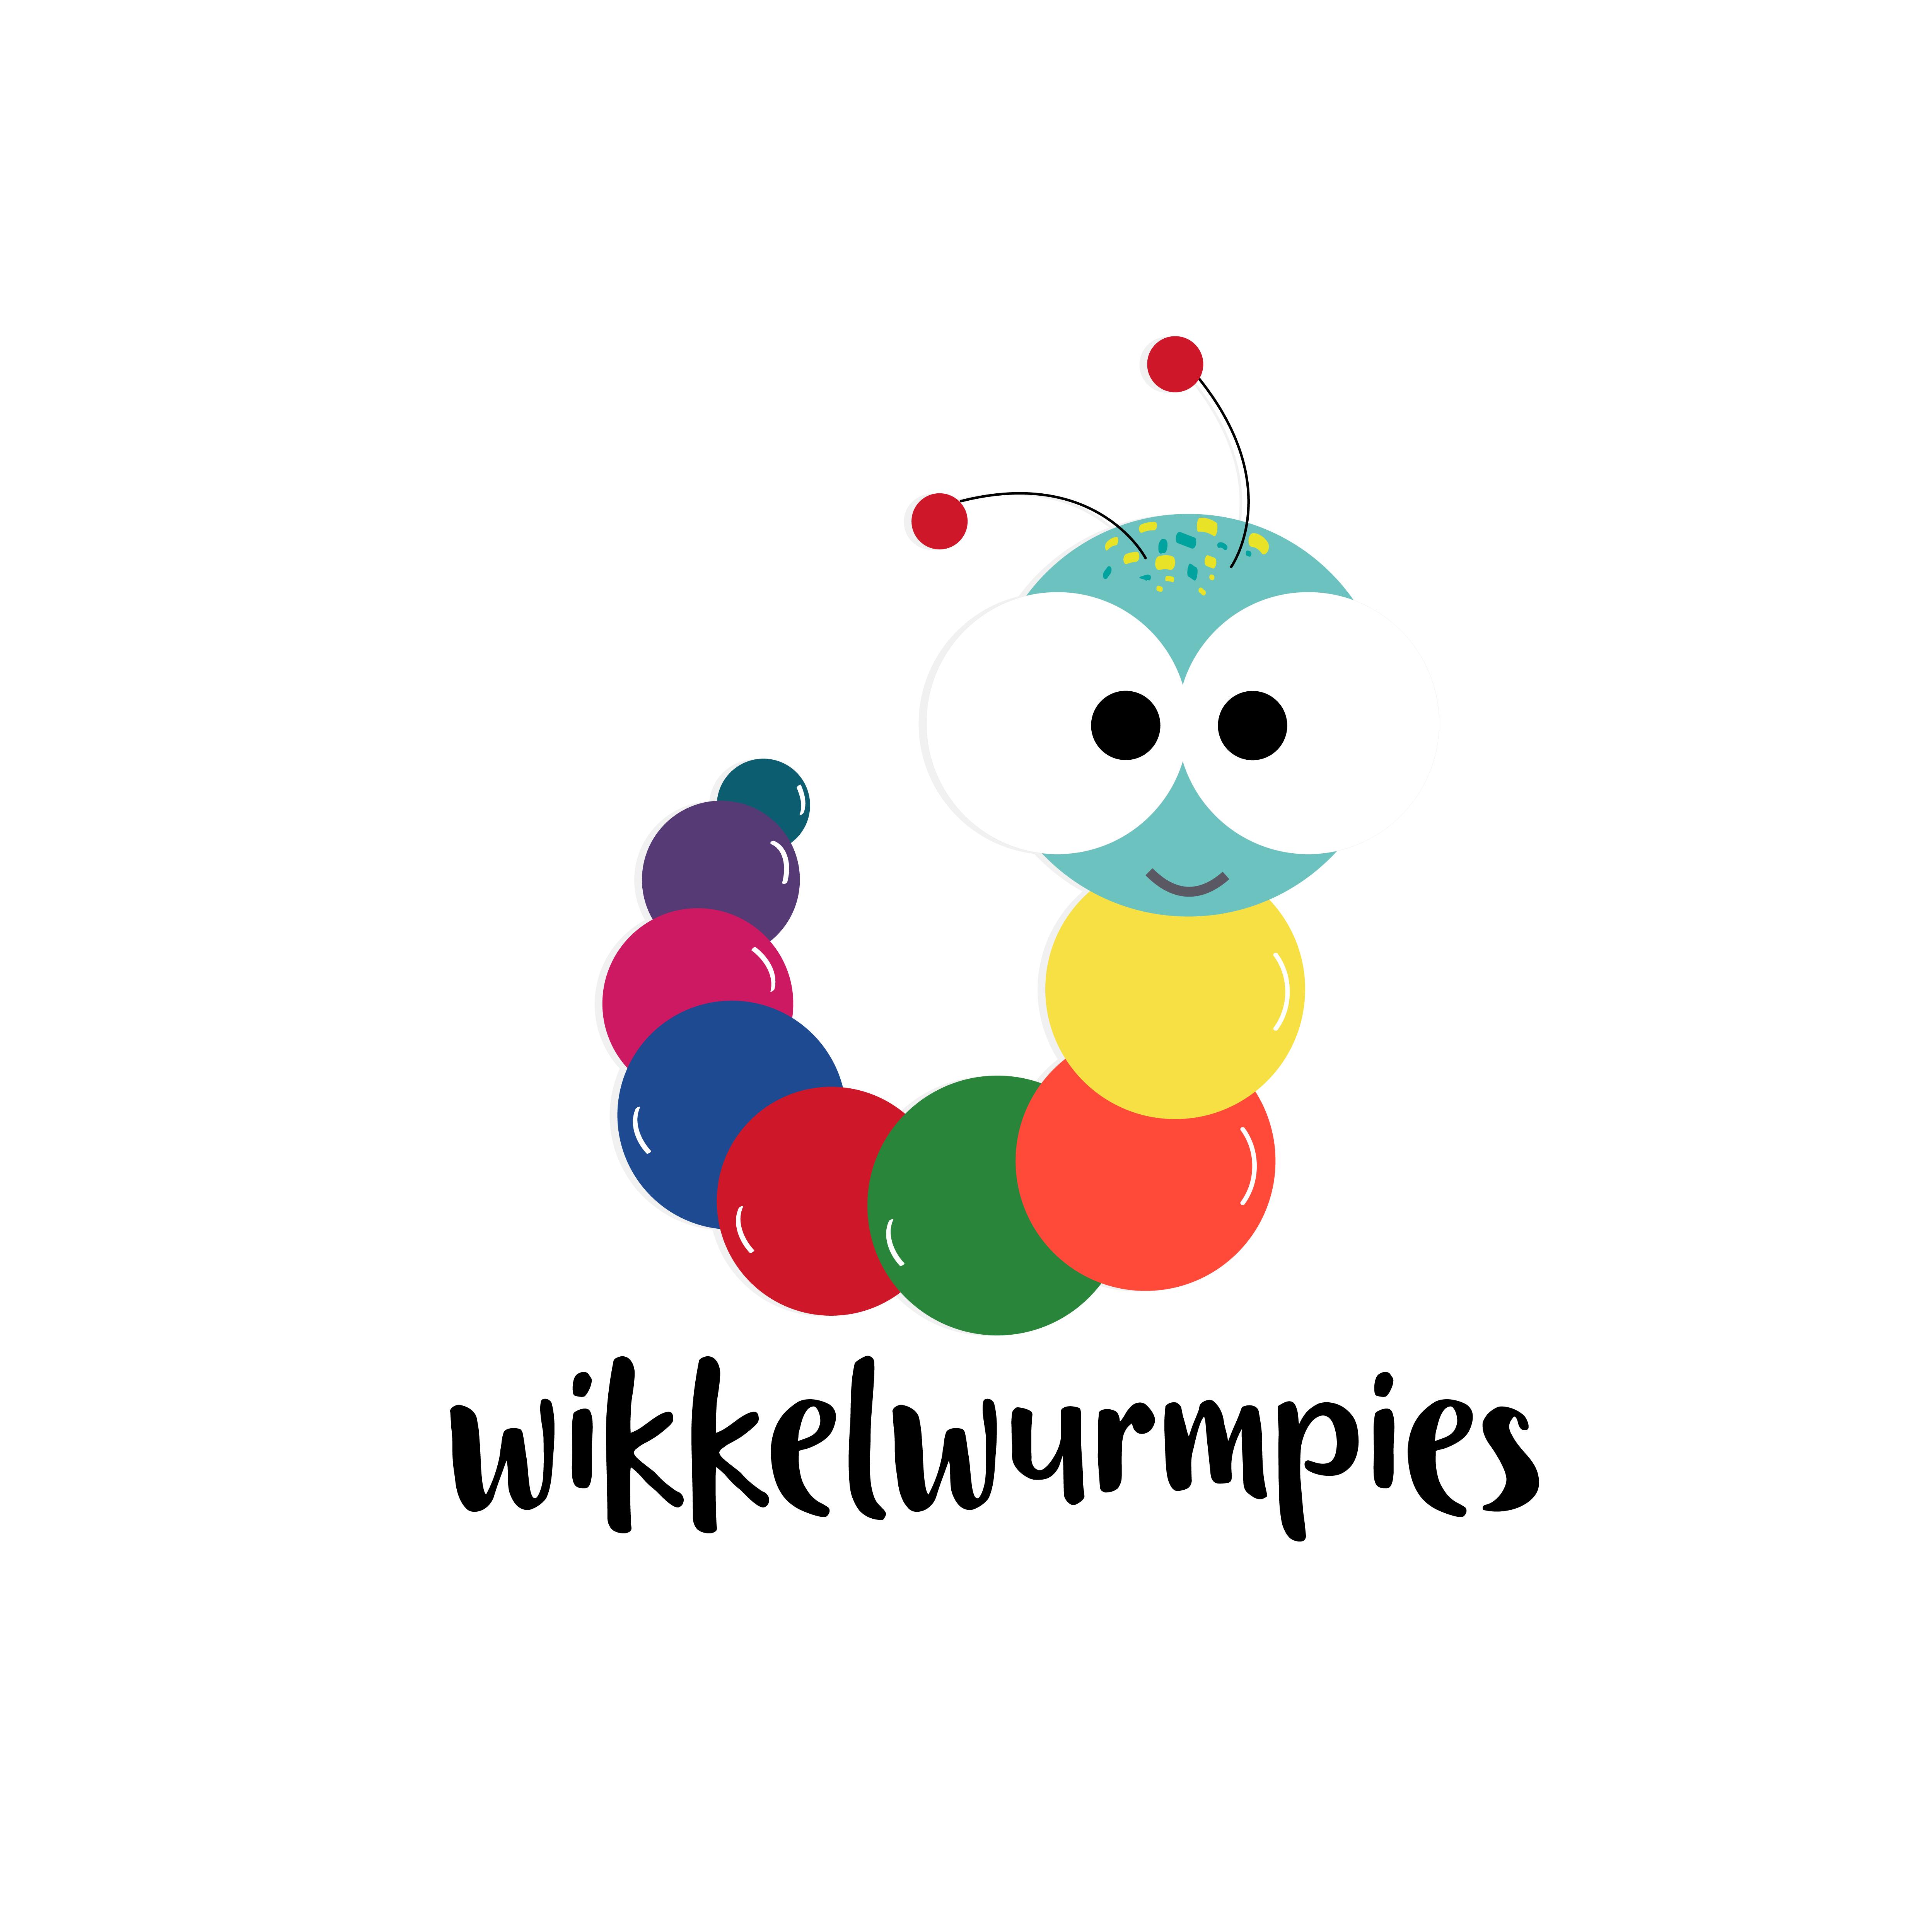 wikkelw_logoAsset 32